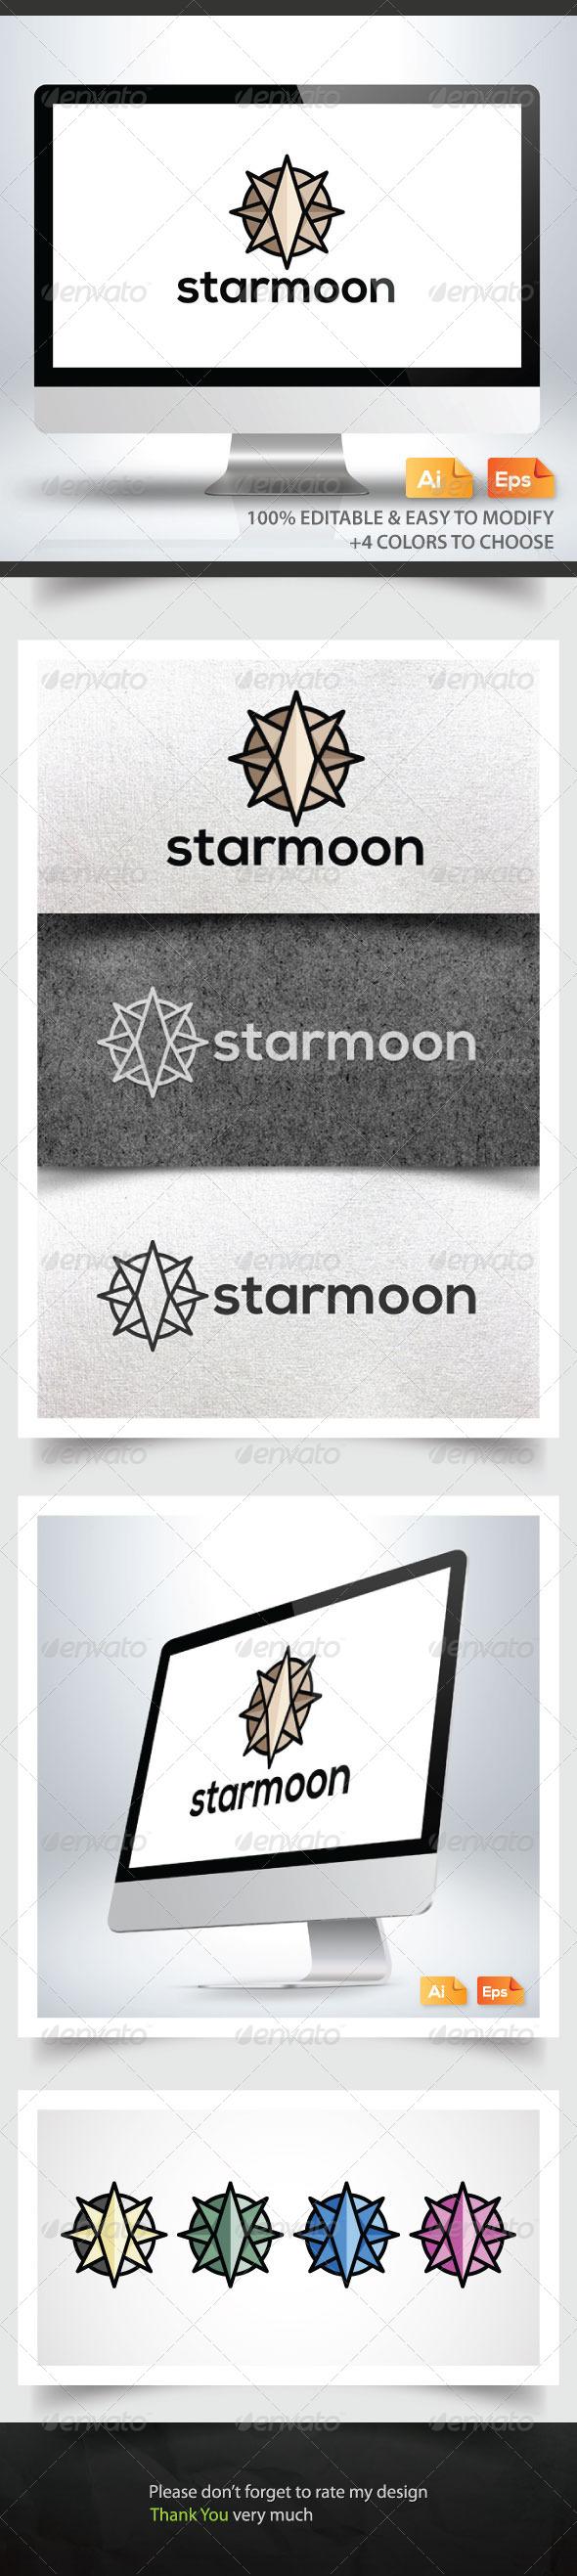 GraphicRiver Starmoon 6252142